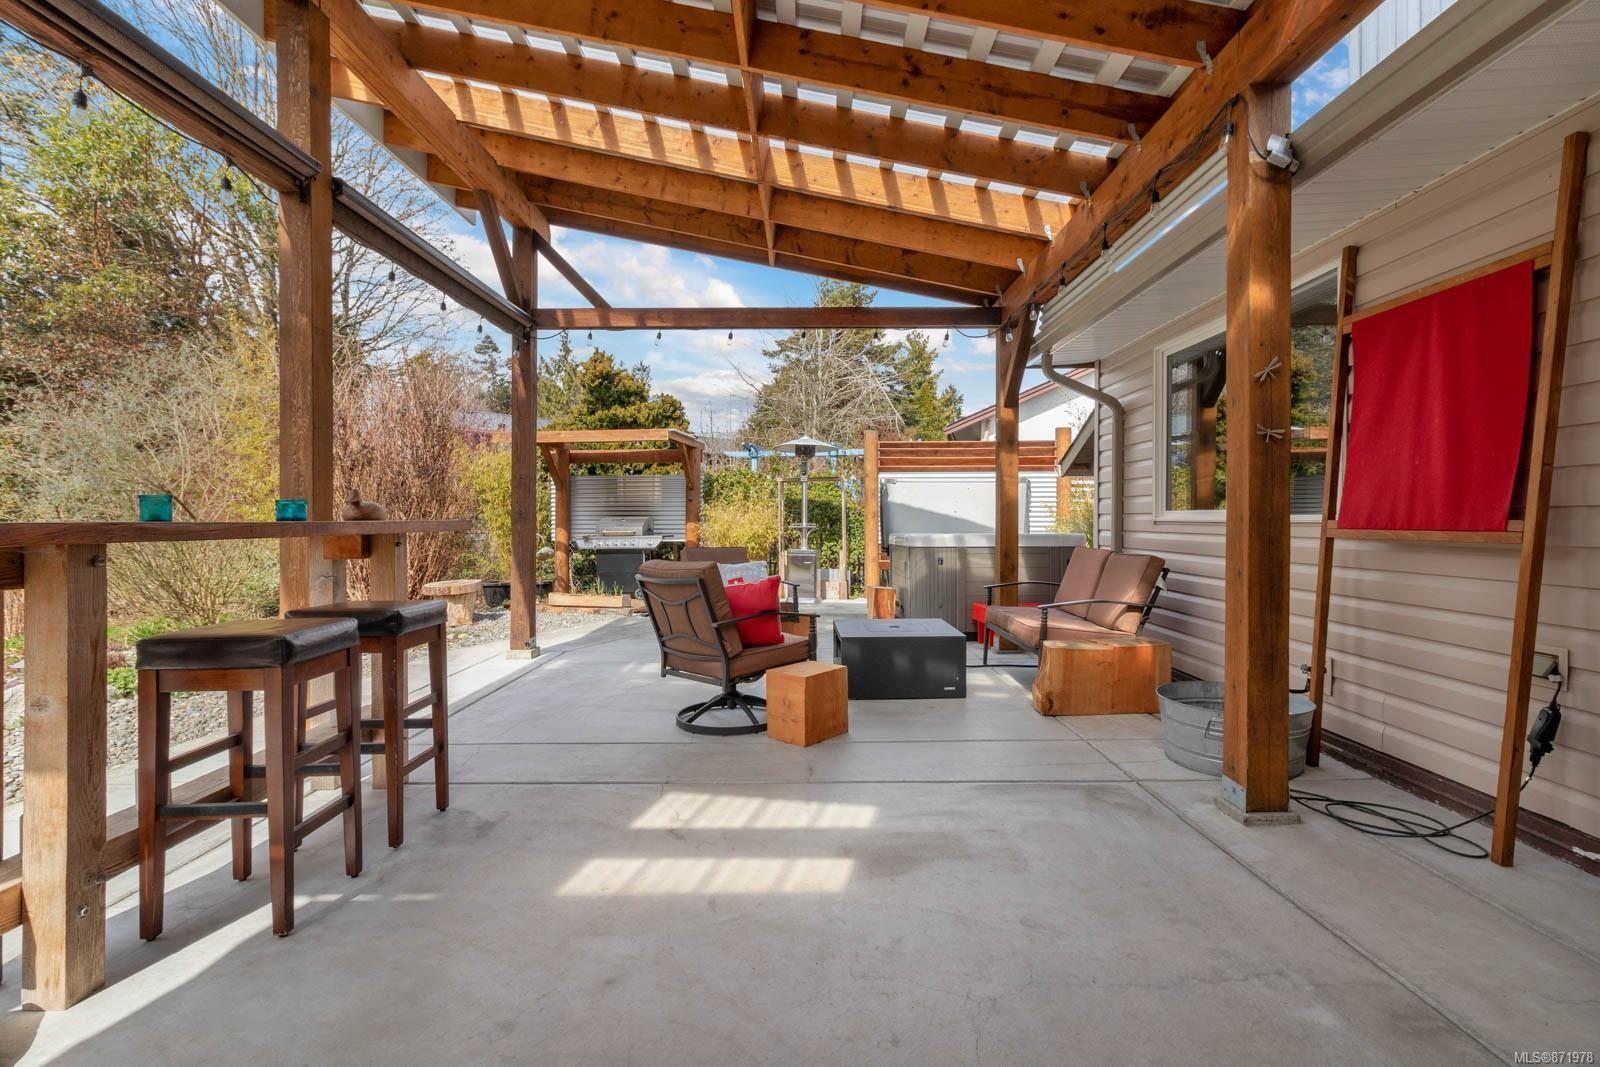 Photo 25: Photos: 1539 Chilcotin Cres in : CV Comox (Town of) House for sale (Comox Valley)  : MLS®# 871978